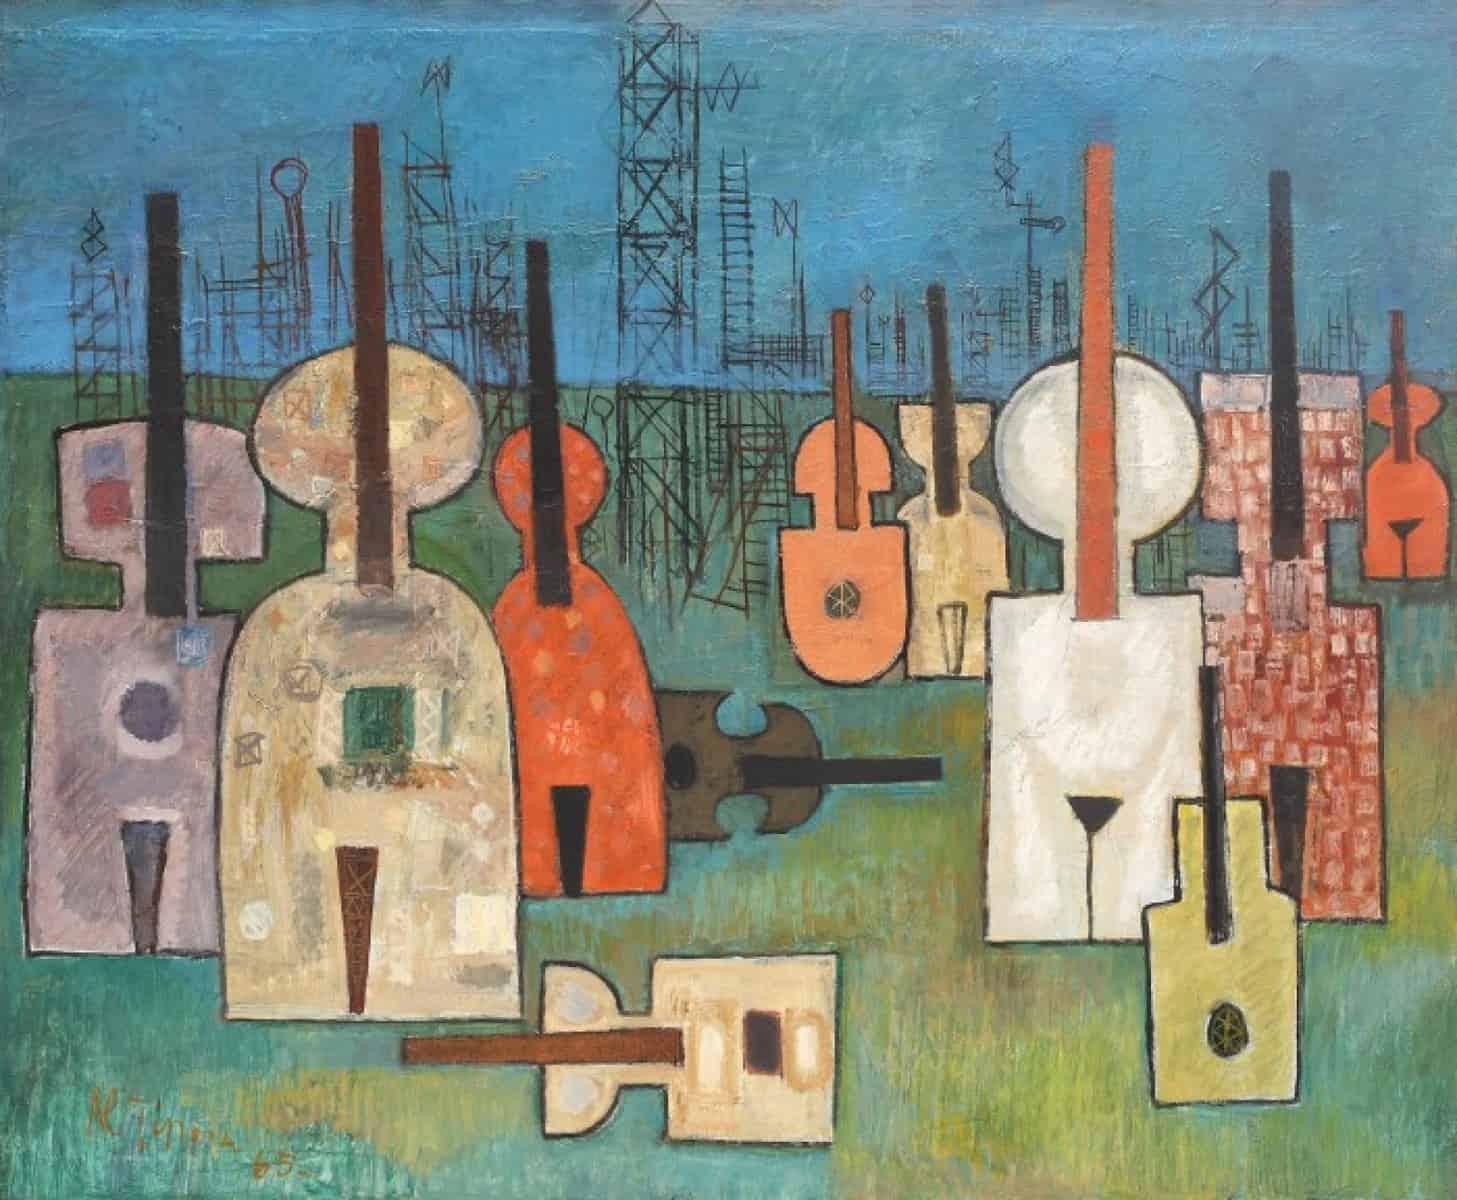 Proiect: Muzicalitatea compoziției abstracte